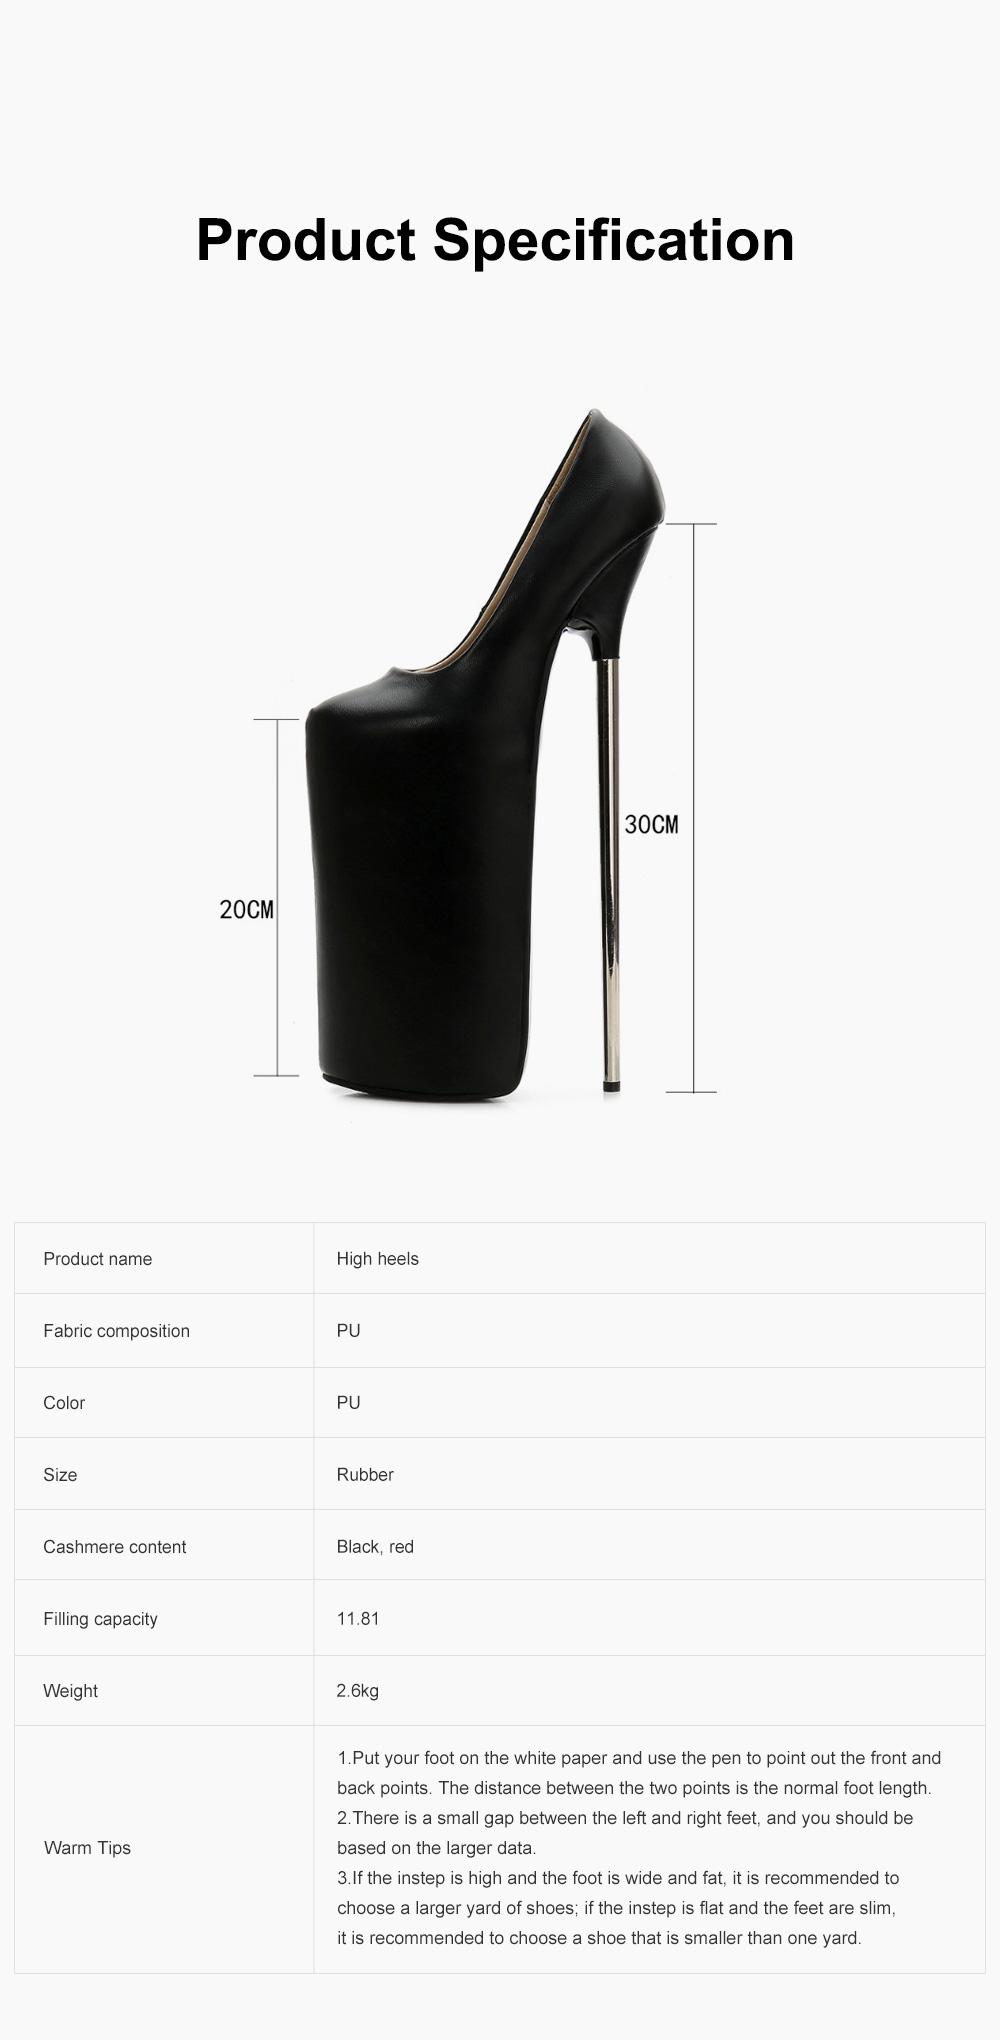 Stylish Sexy 30cm Platform Design High Heels Soft Skin-friendly PU Night Club Shoes with Anti-slip Rubber Sole Ins Hot 6